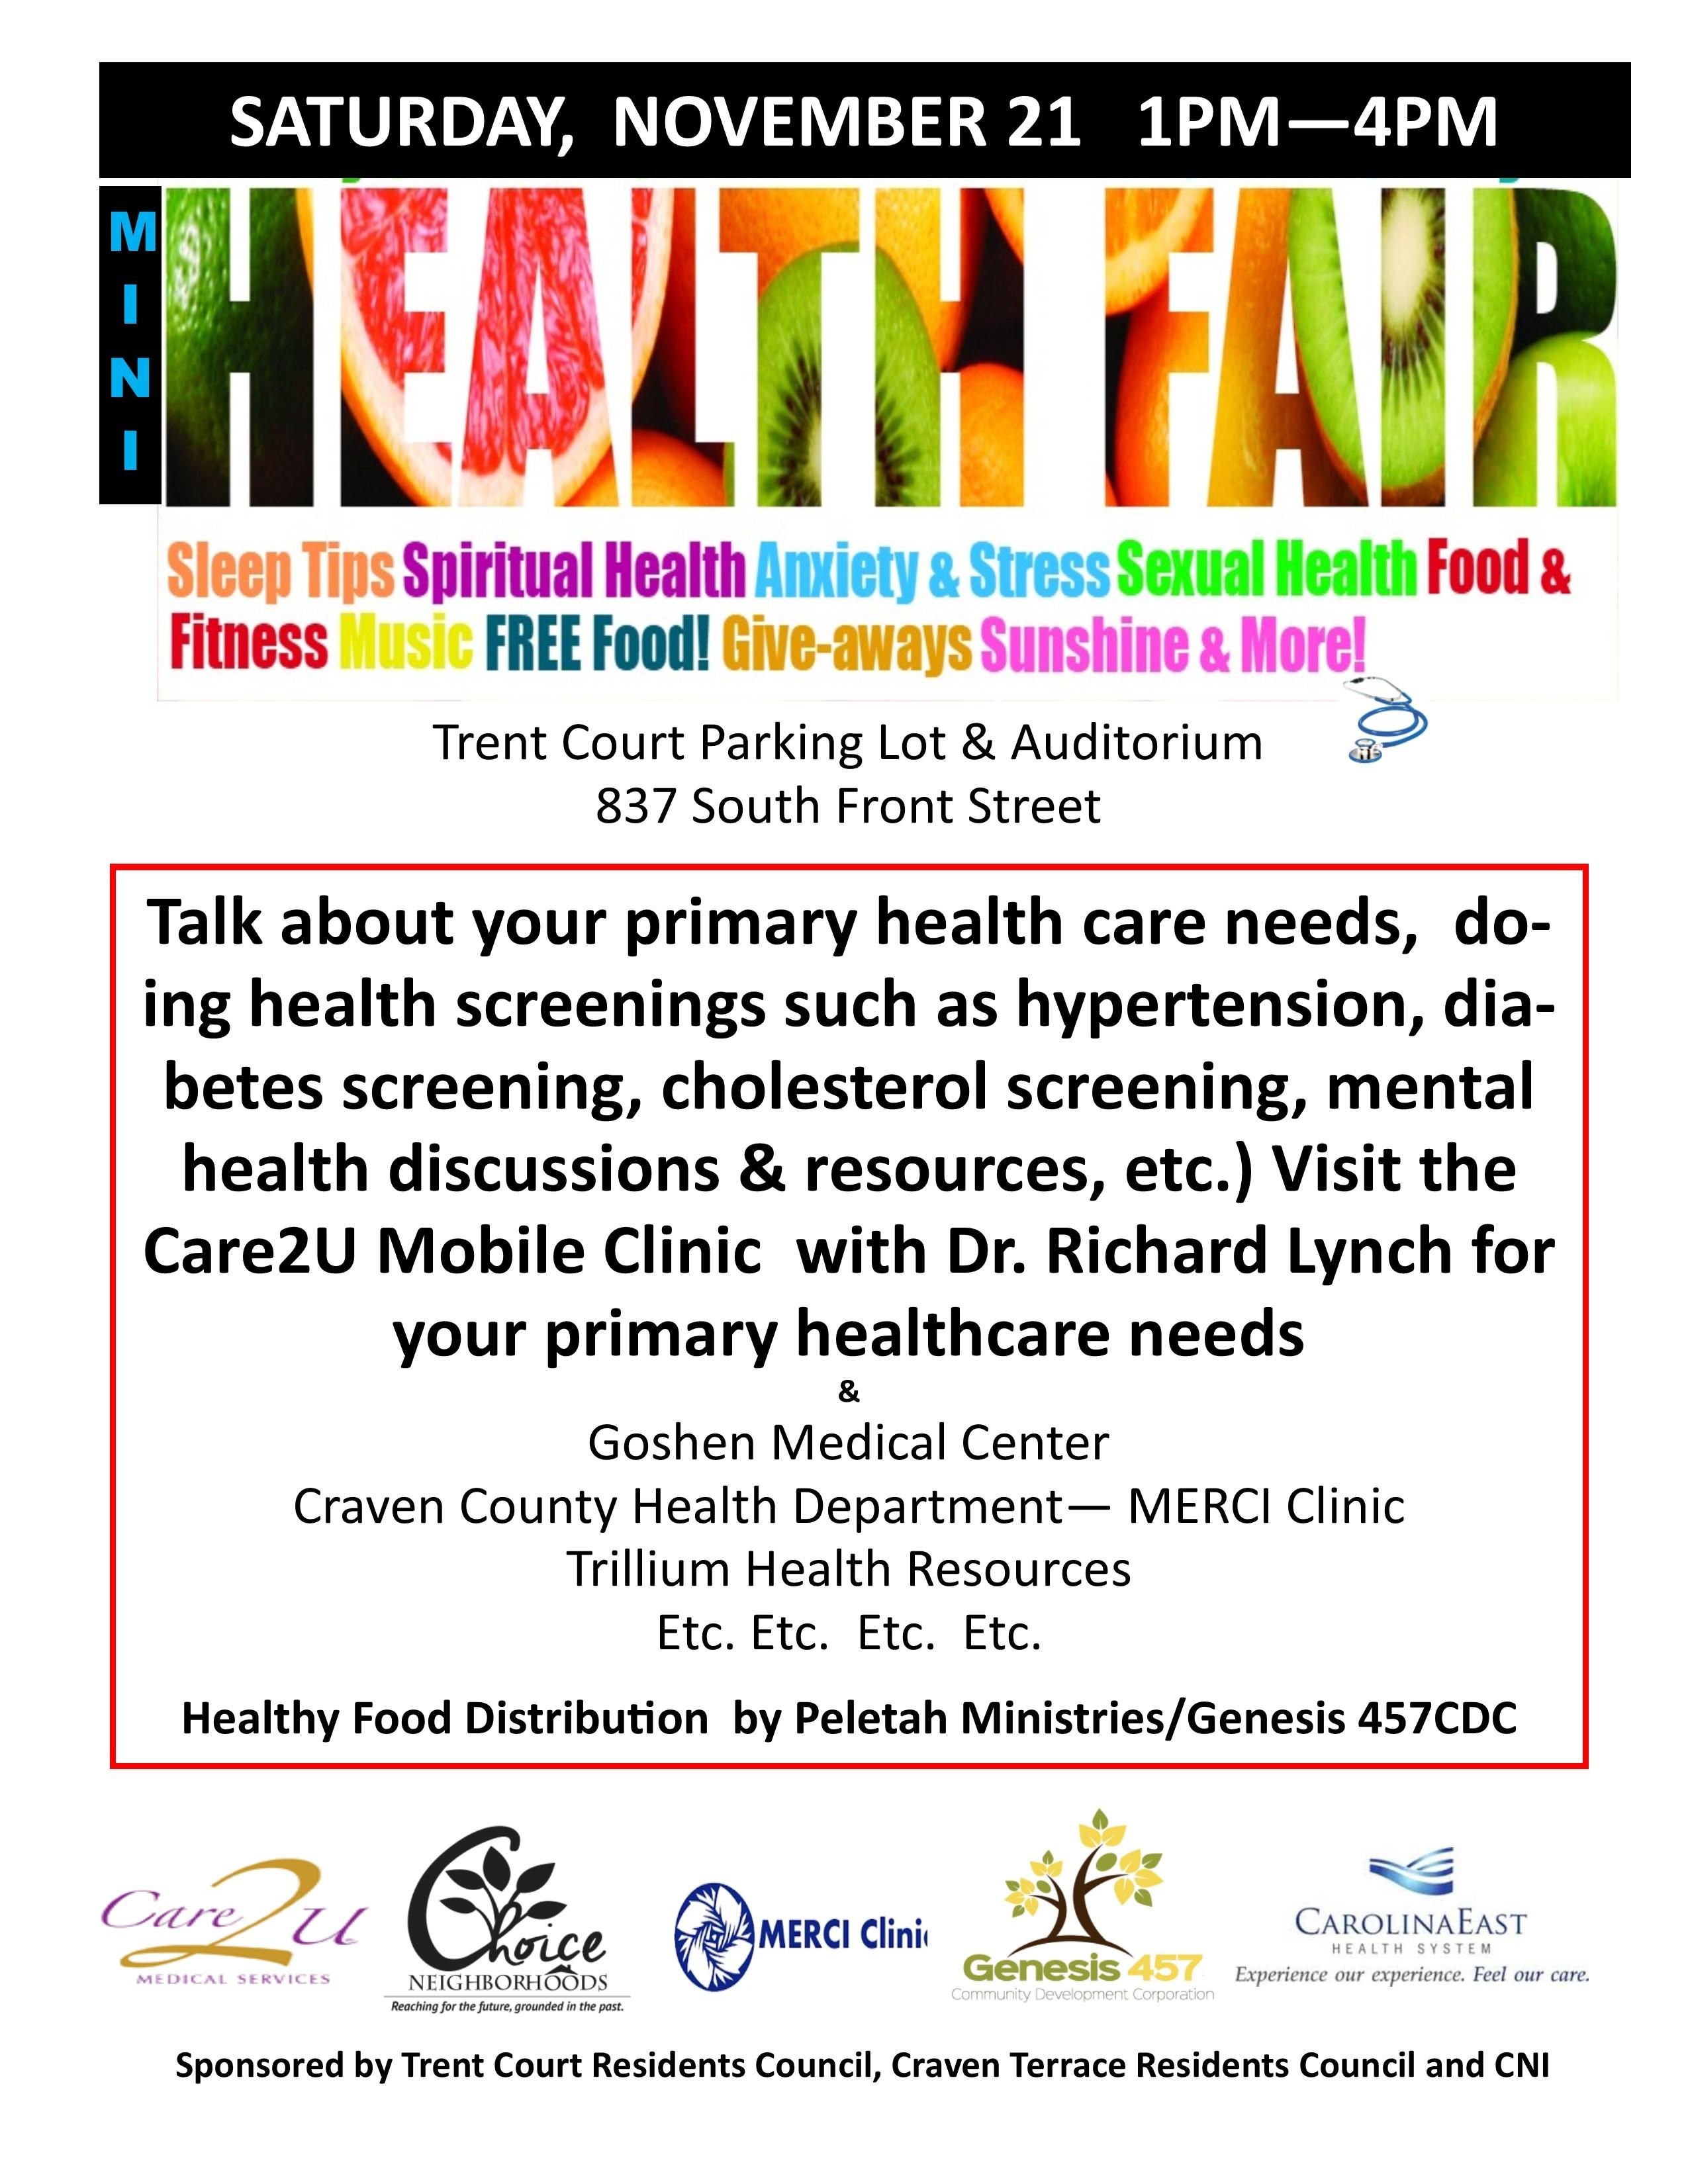 healthfairtrentcourt2015